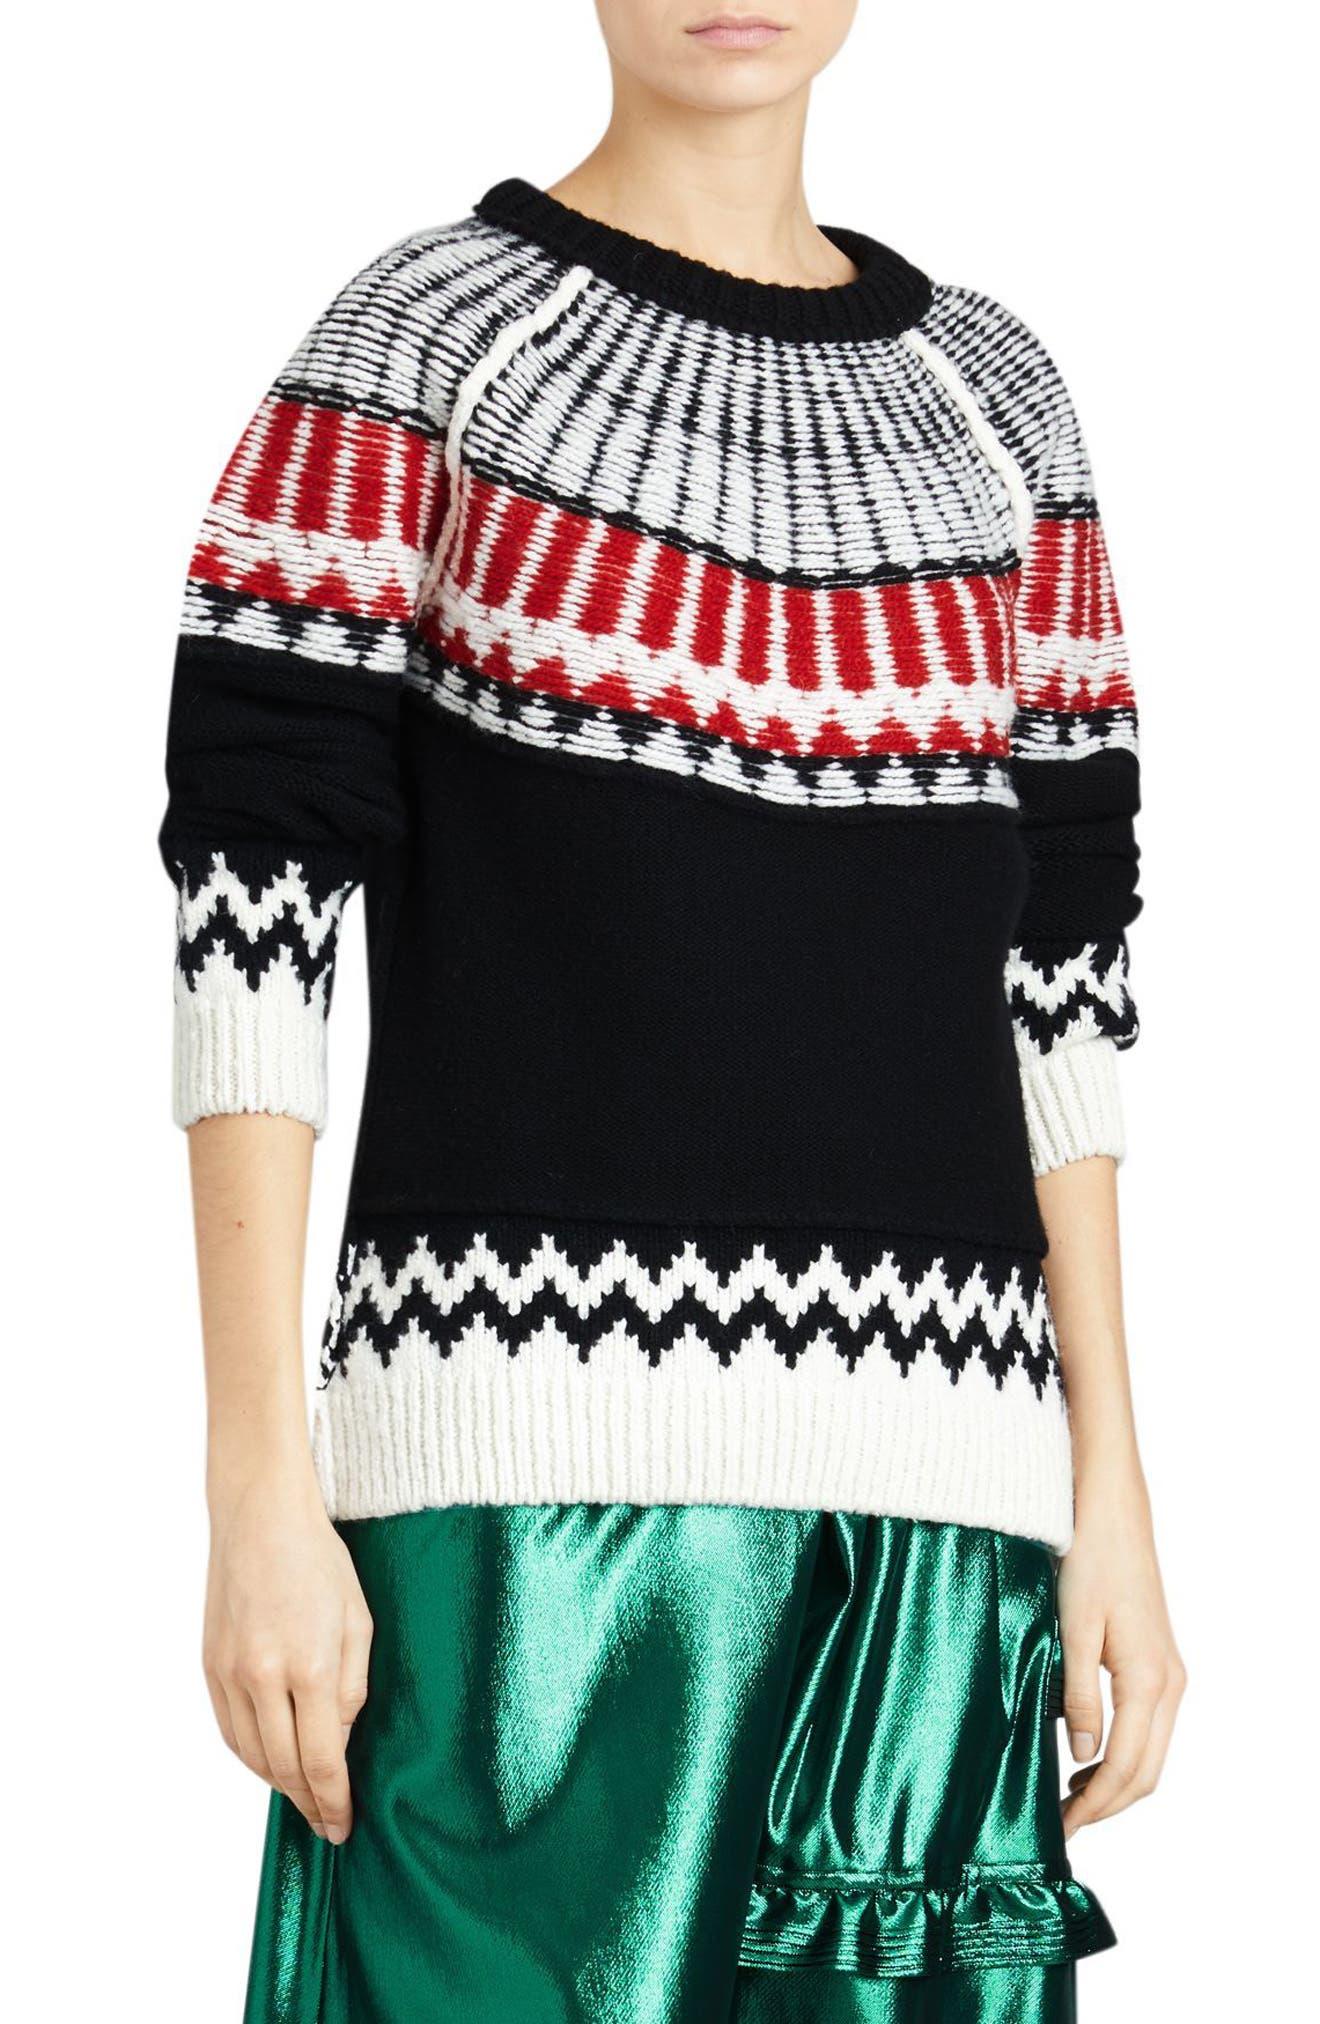 Trycroft Fair Isle Wool Blend Sweater,                         Main,                         color, 001